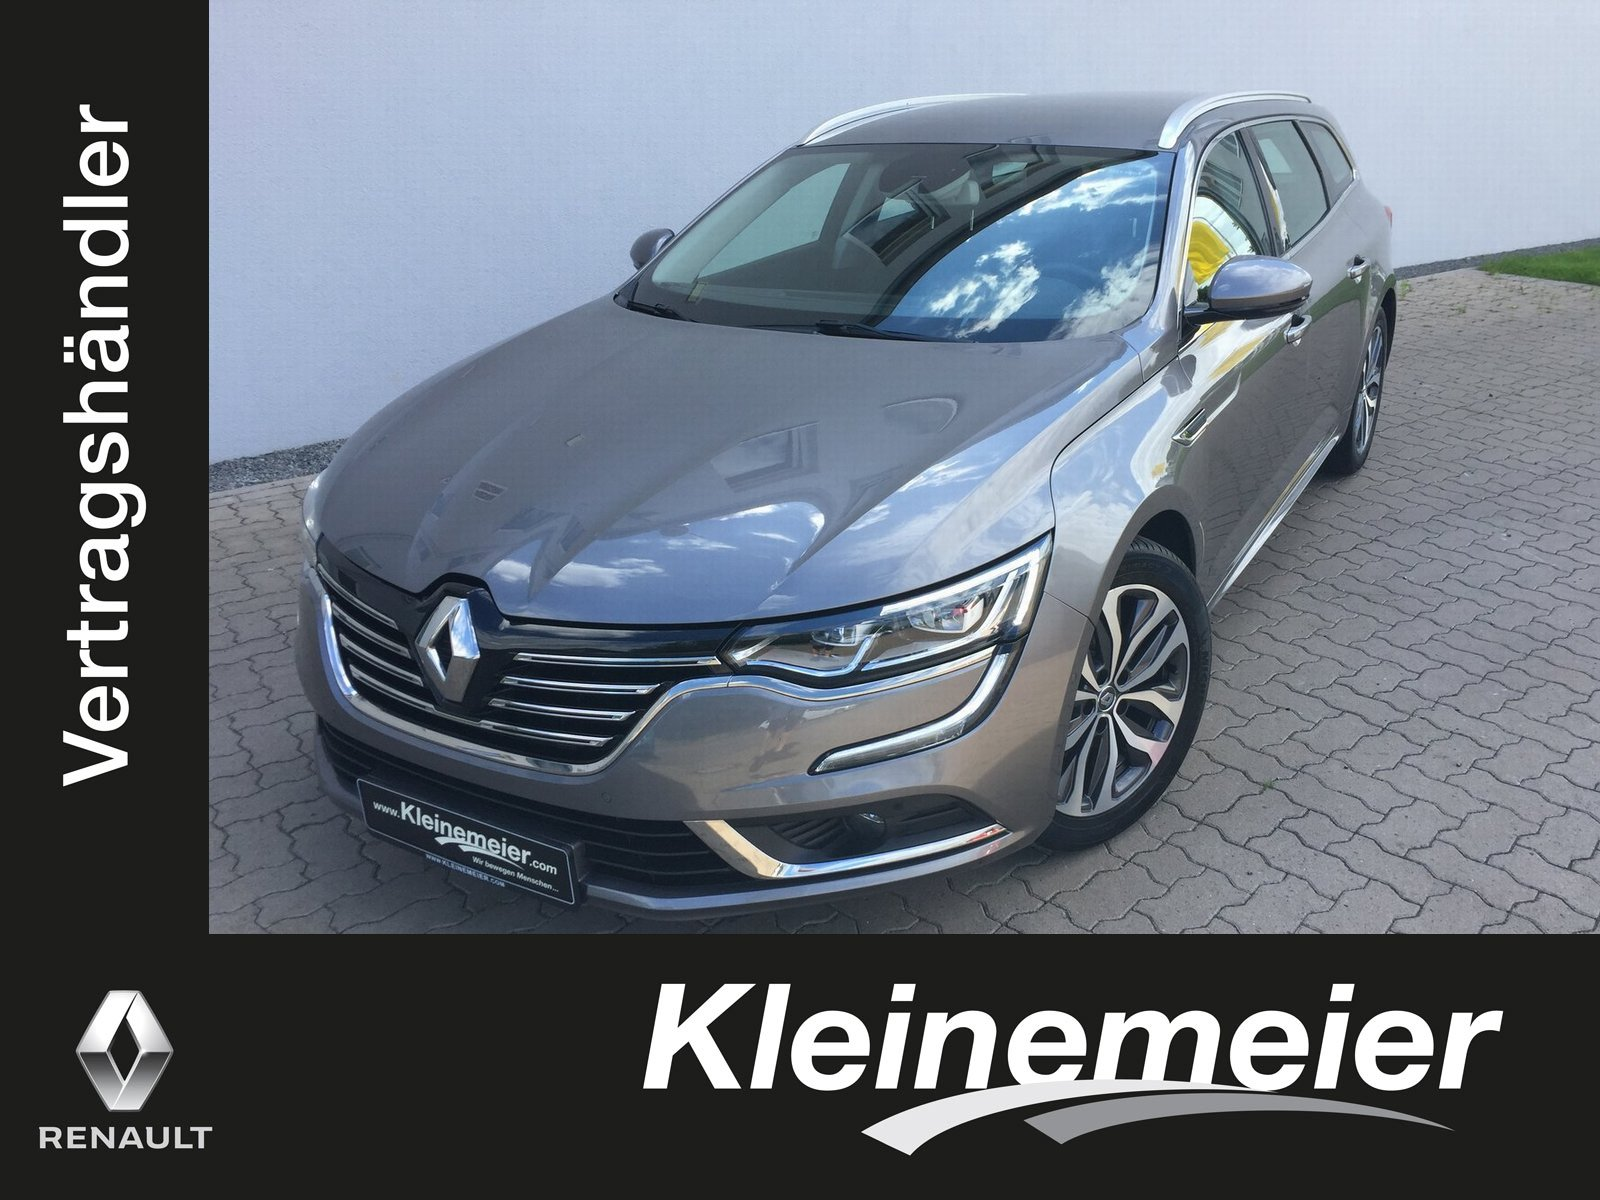 Renault Talisman Grandtour Intens dCi130 *Navi*SZH*RFK*, Jahr 2016, Diesel